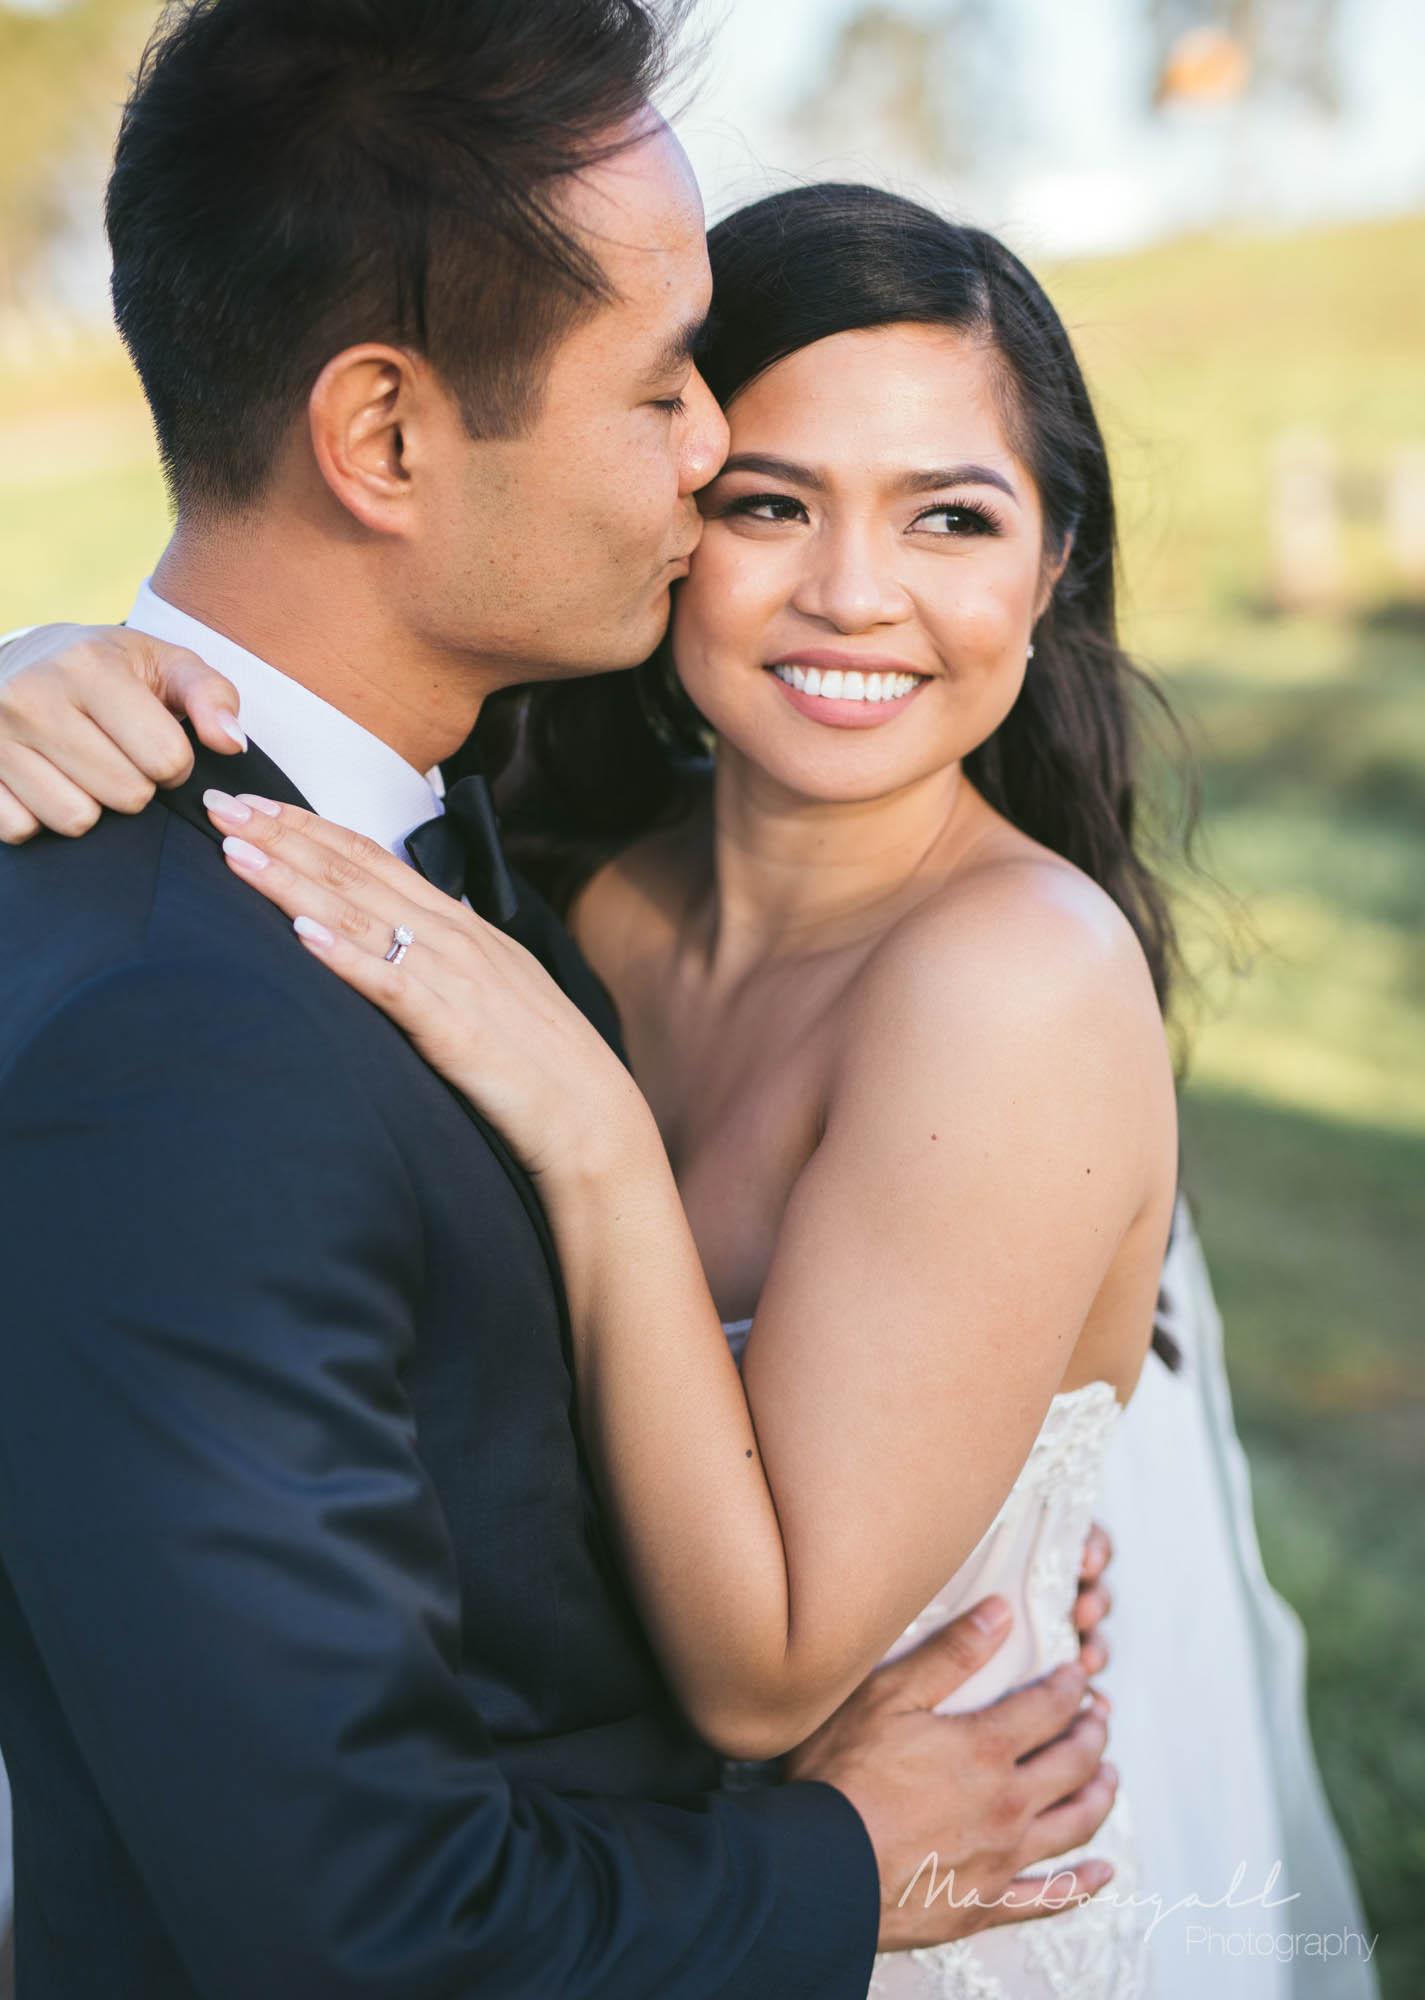 MacDougall-Photography-Sydney-Wedding-Photographers-26.jpg